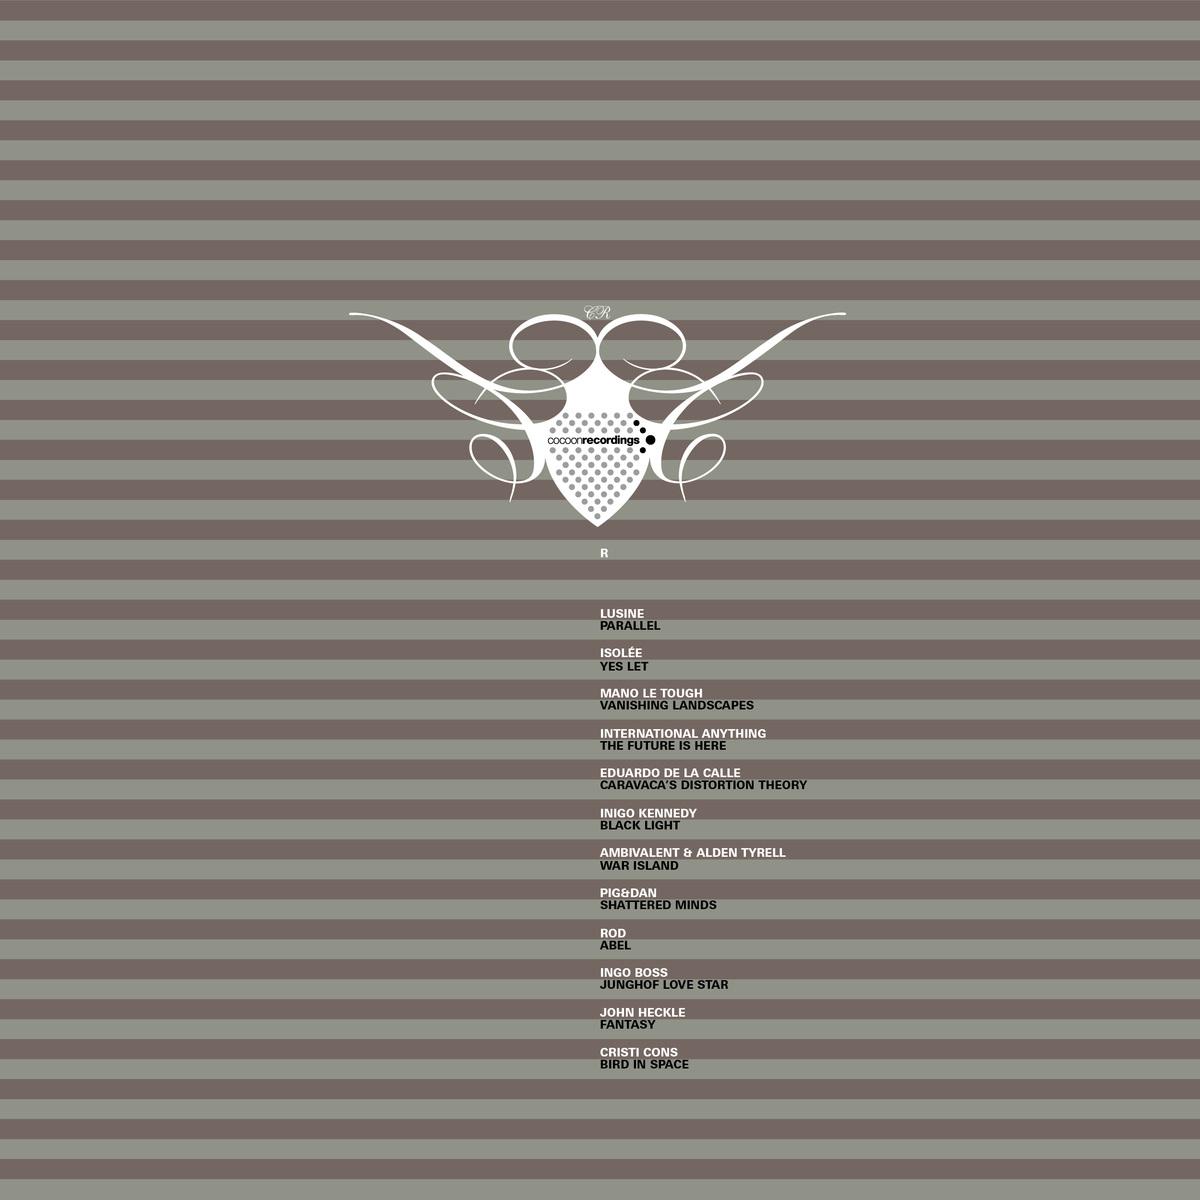 Ingo Boss - Junghof Love Star (Original Mix)